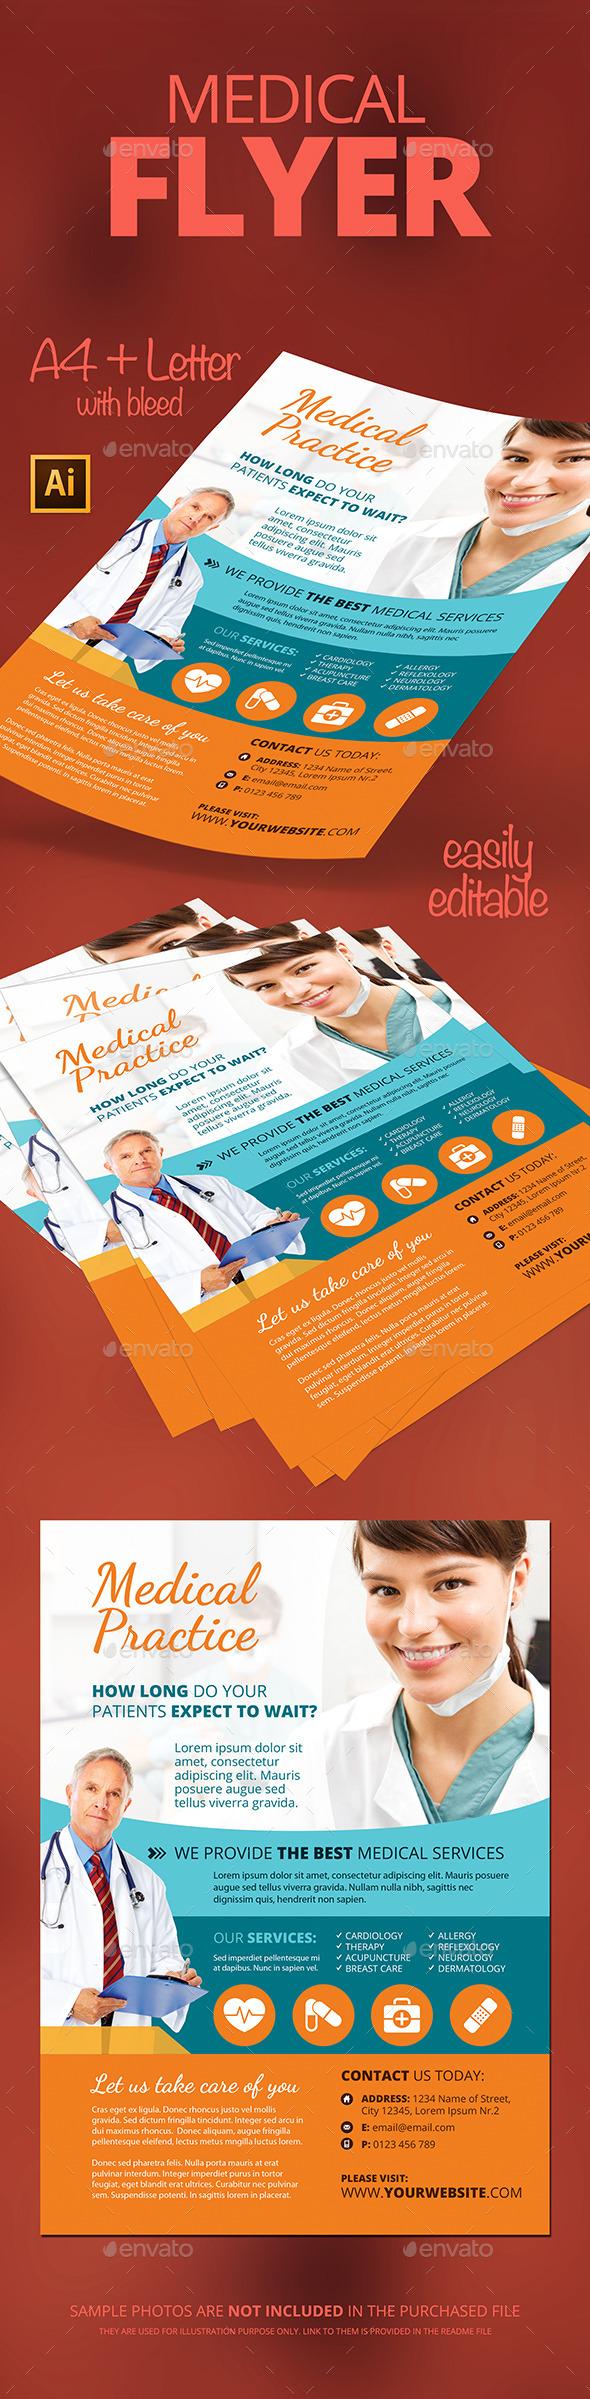 medical flyer psd template design download http graphicriver net